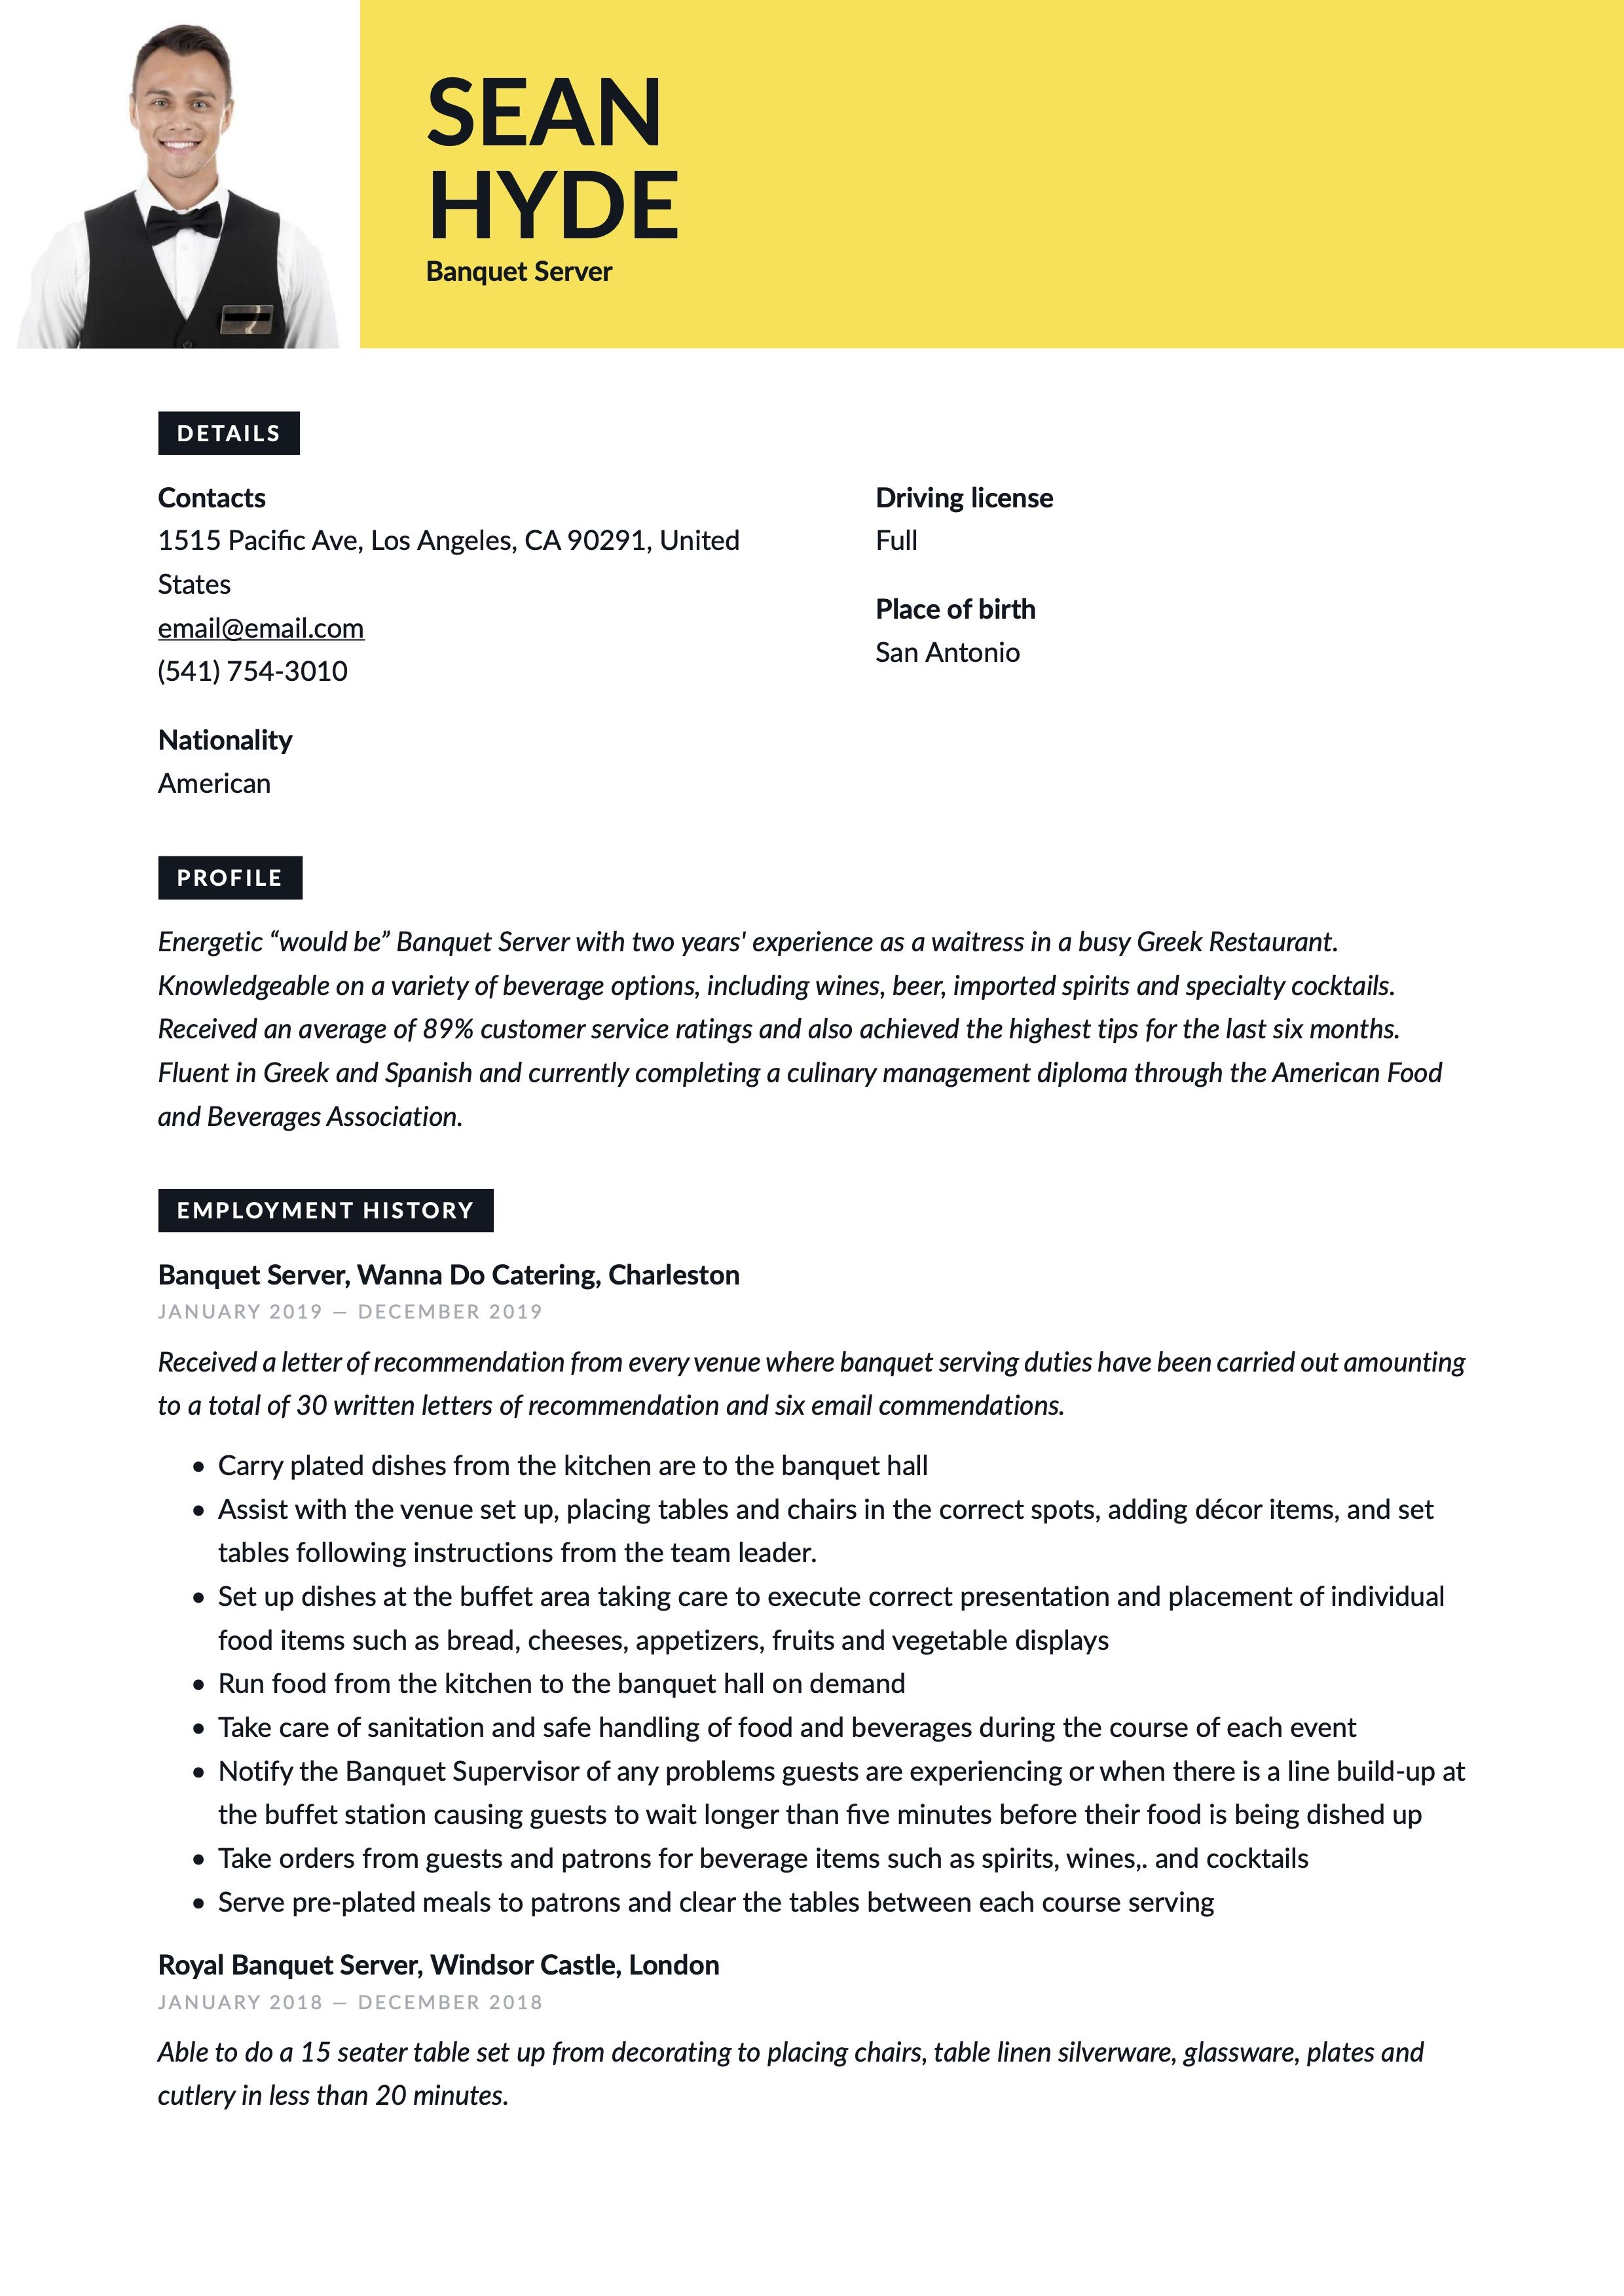 Banquet Server Resume Template in 2020 Server resume